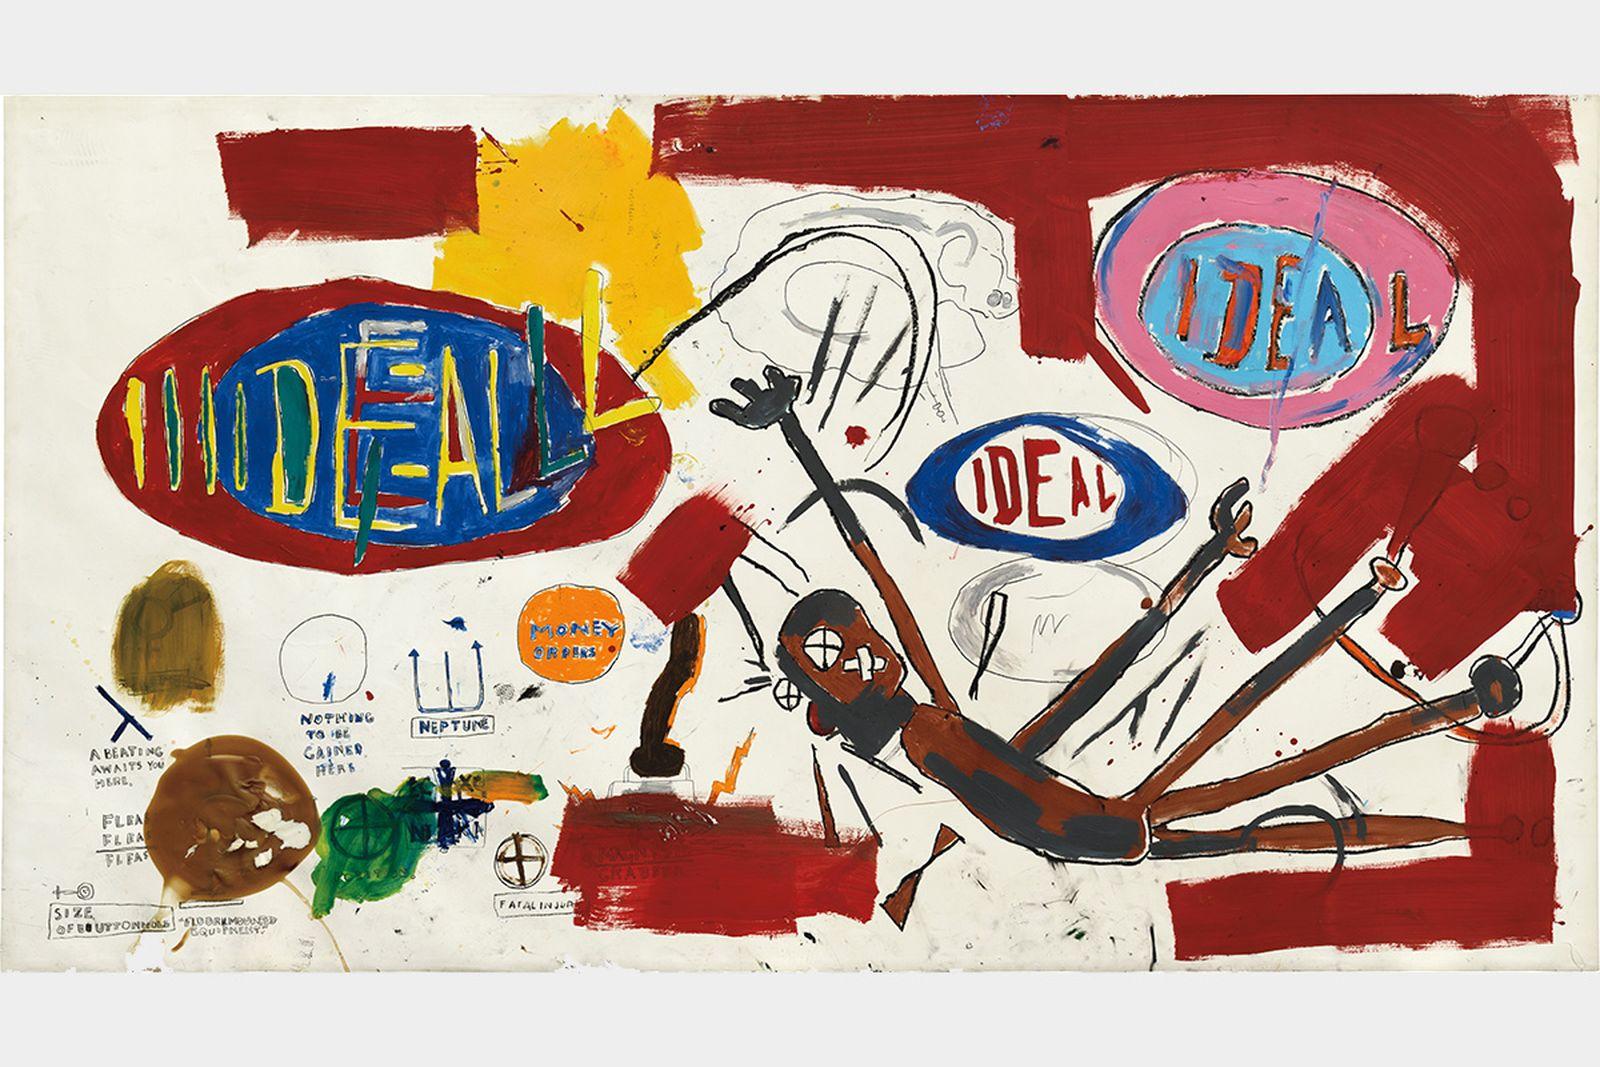 Jean Michel Basquiat 'victor' painting